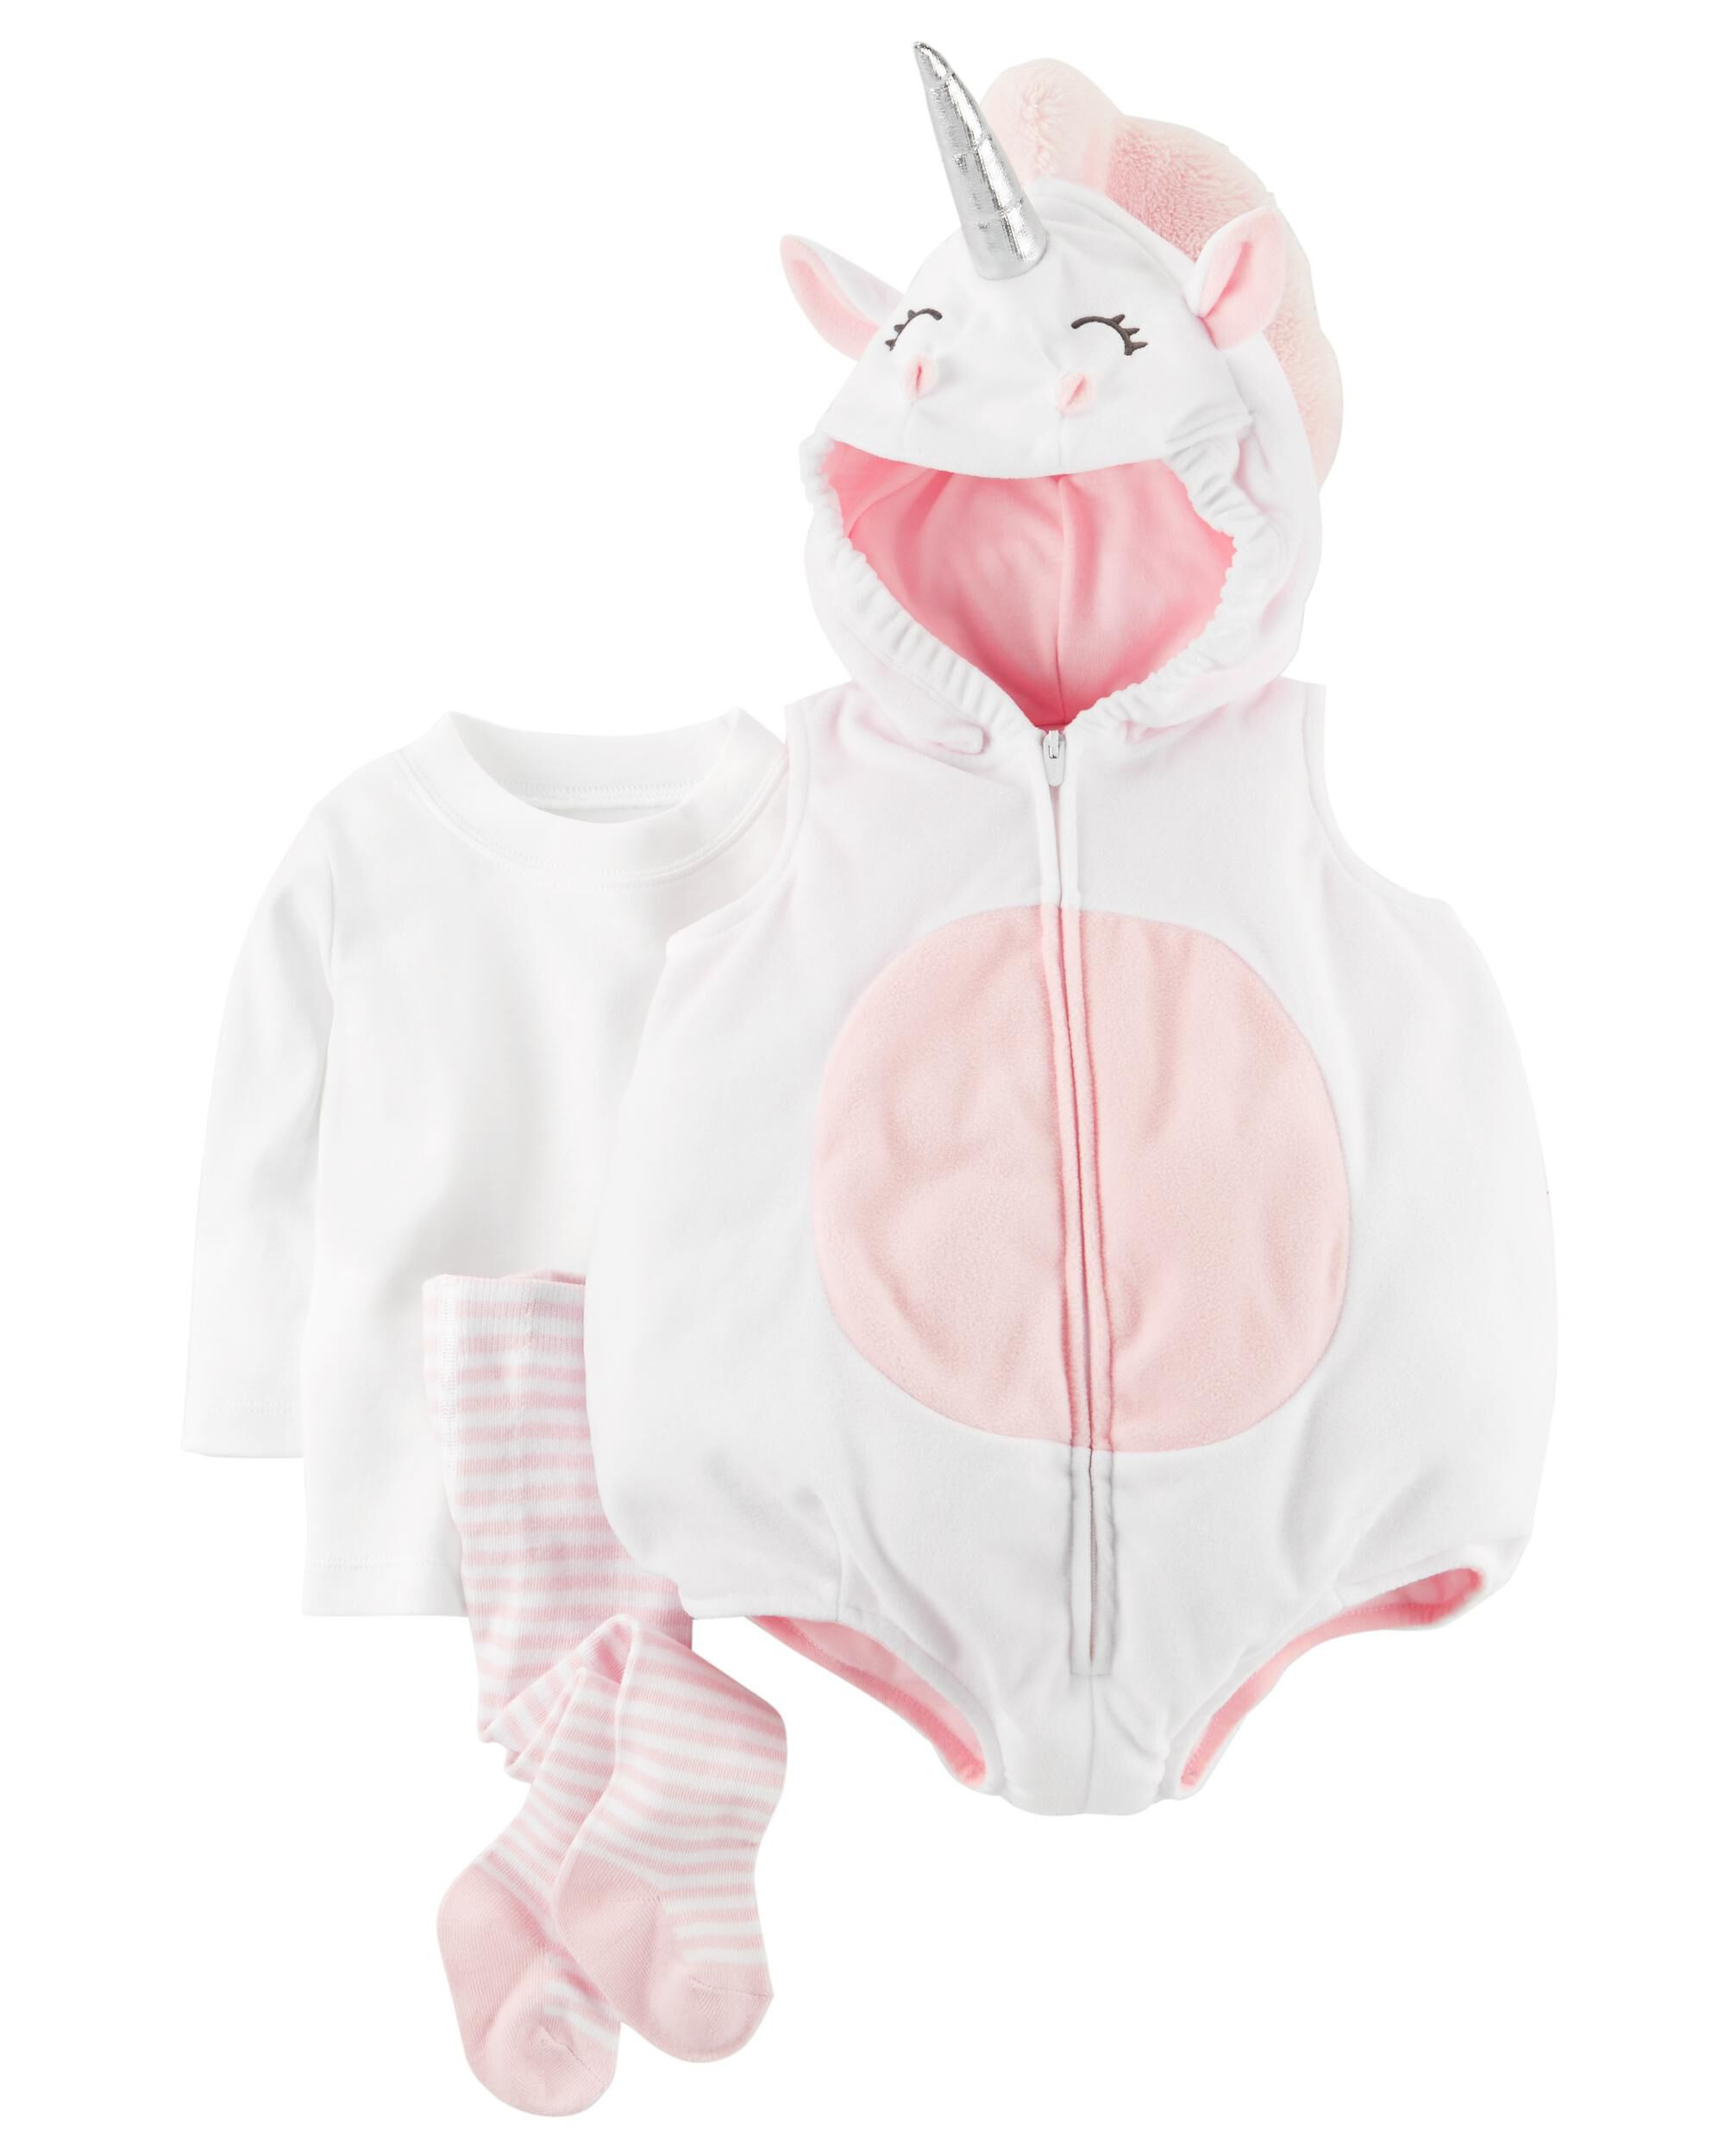 Brand New Carter/'s Unicorn Baby Girl/'s Halloween Costume 3pc set size 18m hooded